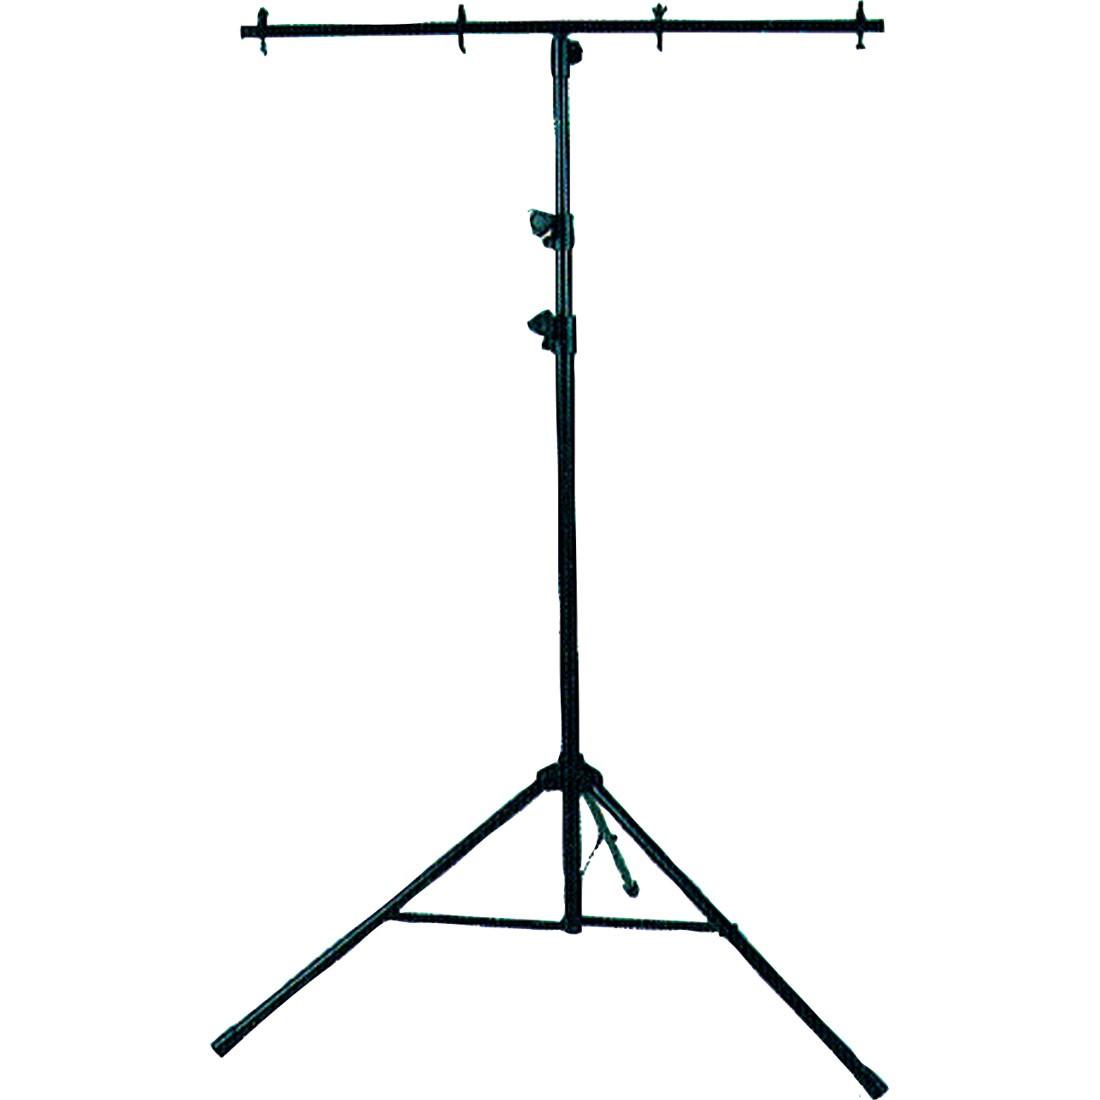 Lts 6 Lighting Stand